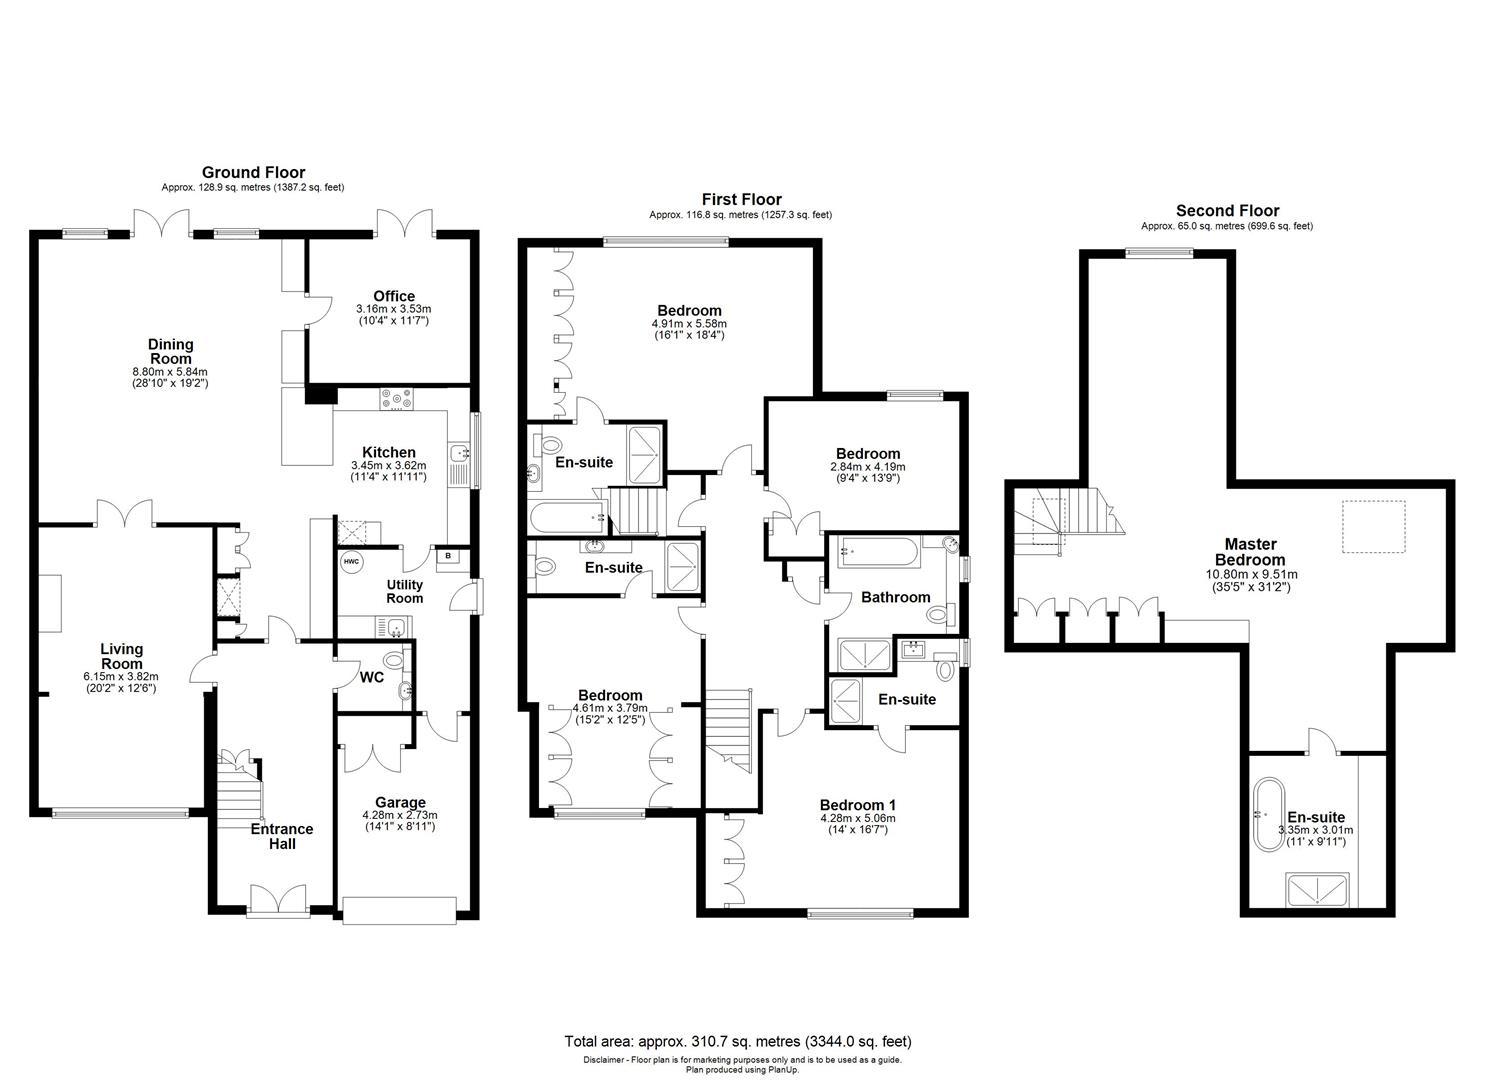 37_-South-Park-Gardens_-BERKHAMSTED (1) - floorpla